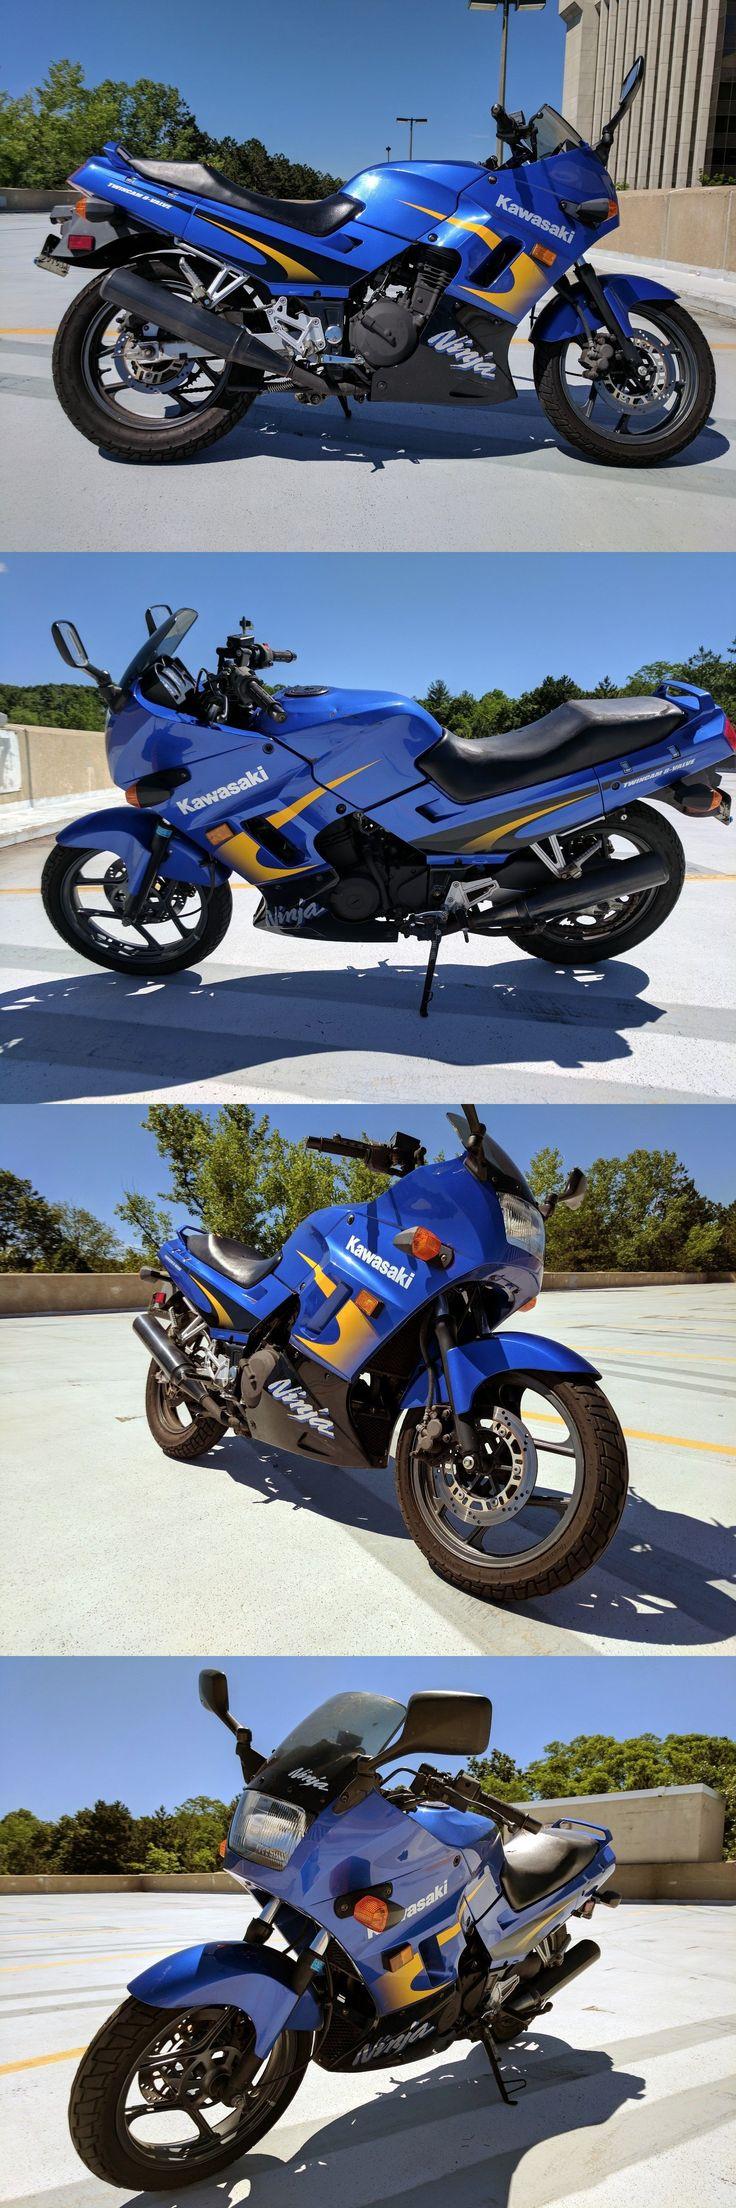 Motorcycles: 2003 Kawasaki Ninja 2003 Ninja 250R Ex250 Free Local Delivery -> BUY IT NOW ONLY: $1600 on eBay!